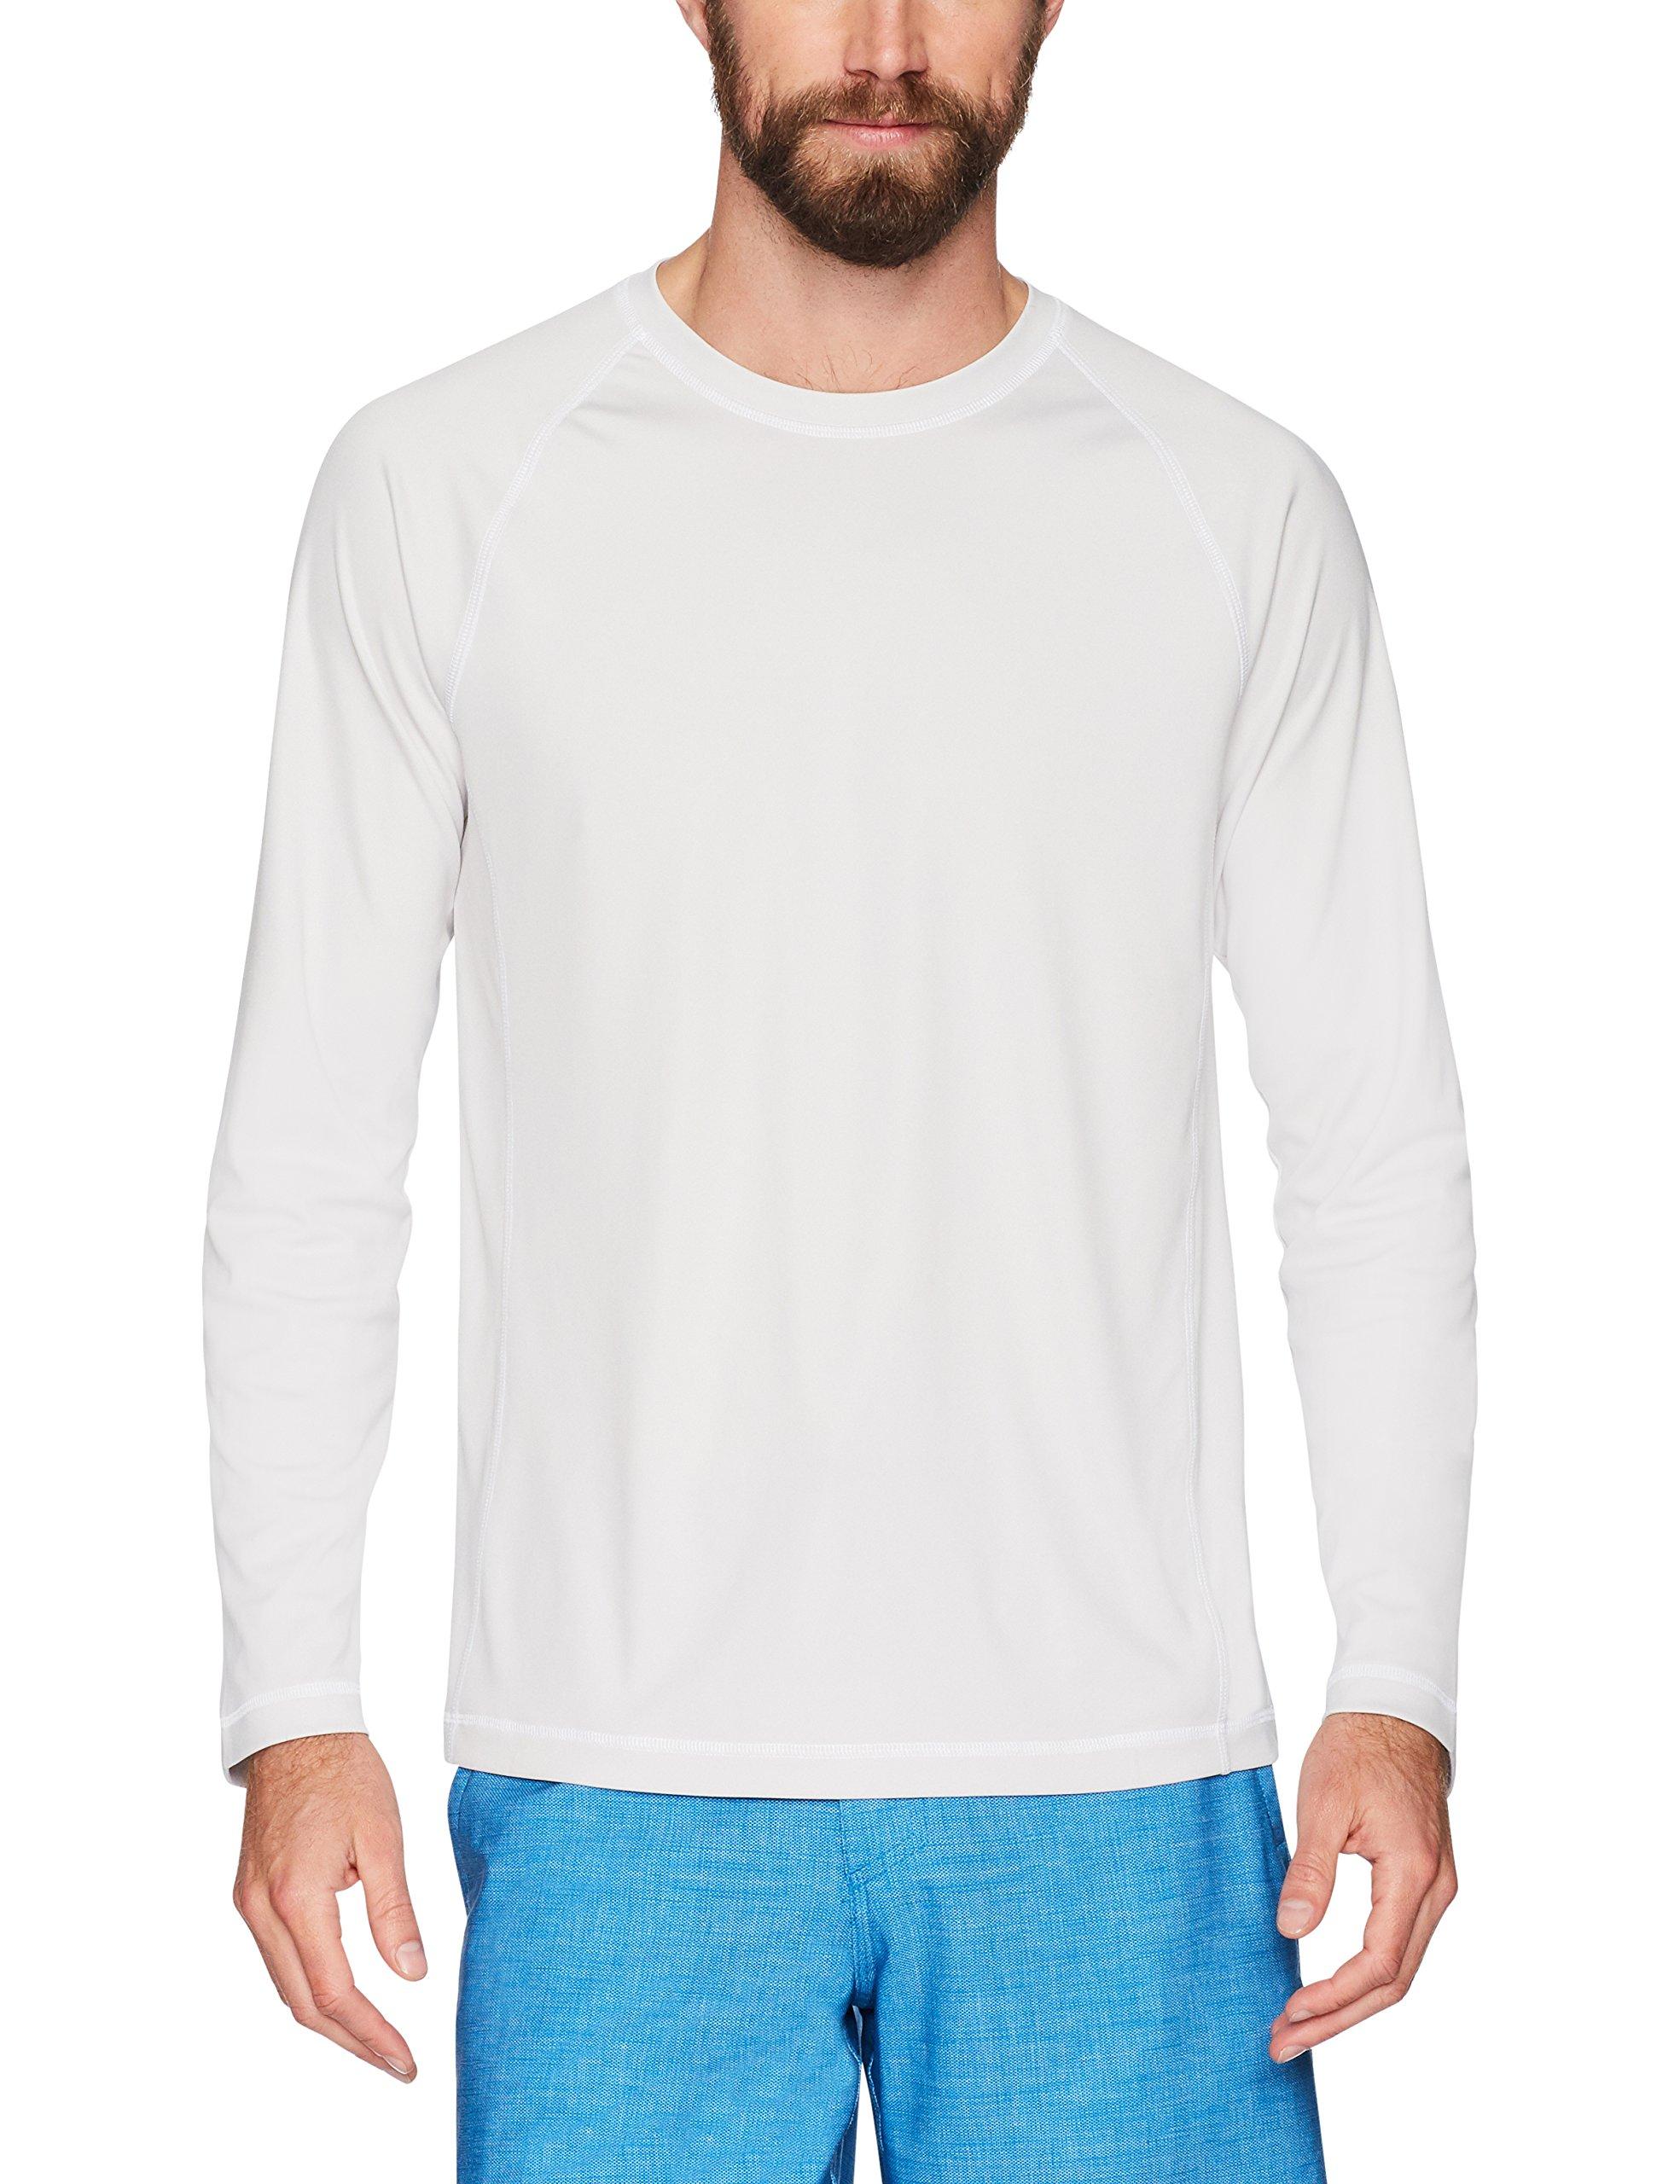 Amazon Essentials Men's Long-Sleeve Quick-Dry UPF 50 Swim Tee, Silver, Medium by Amazon Essentials (Image #3)